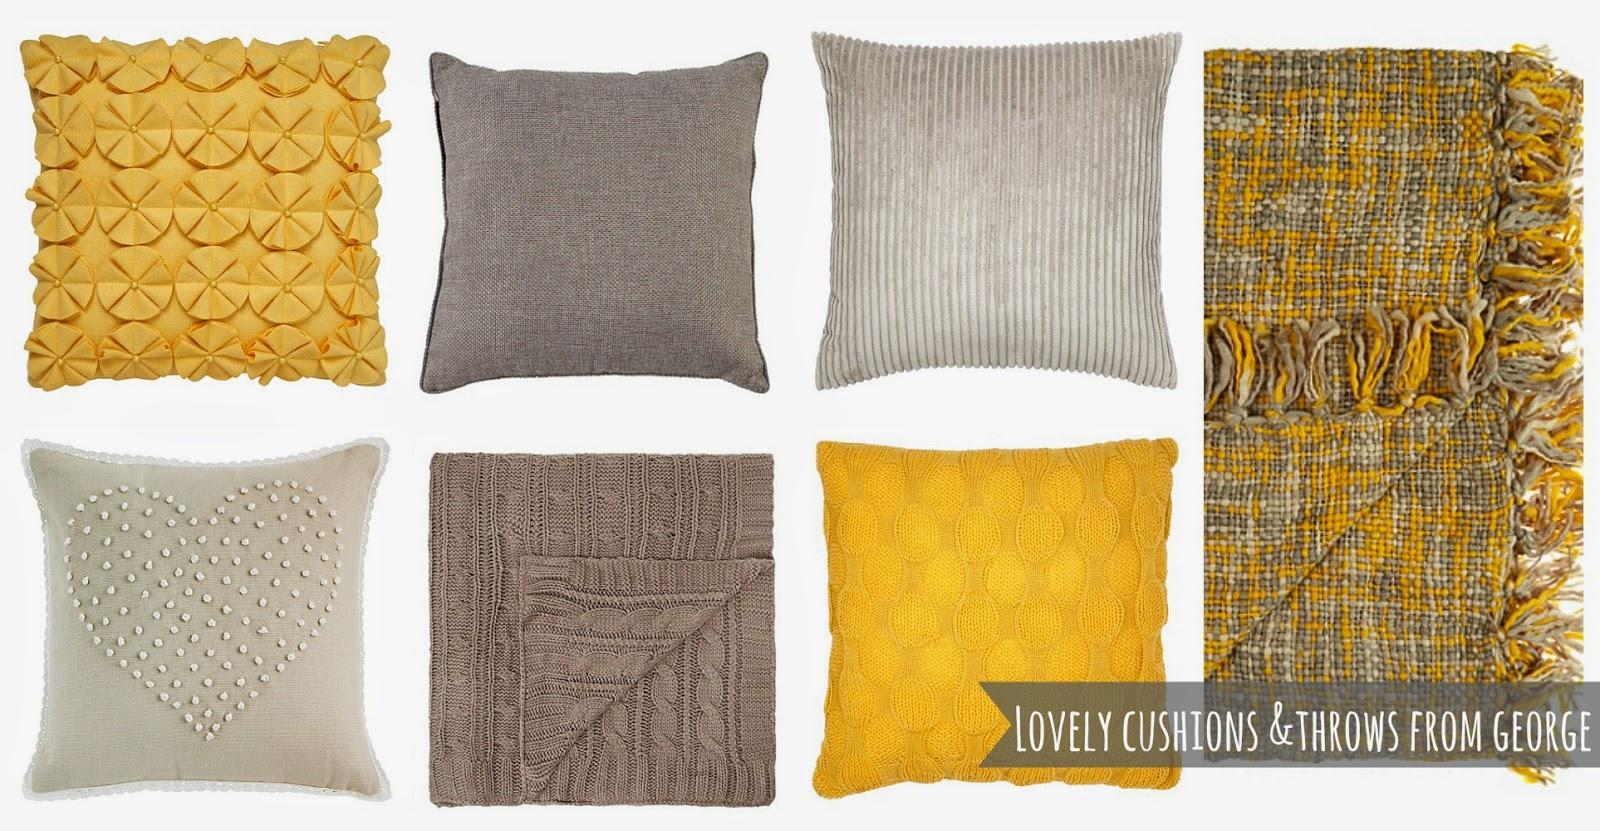 gorgeous cushions throws from george at asda k elizabeth